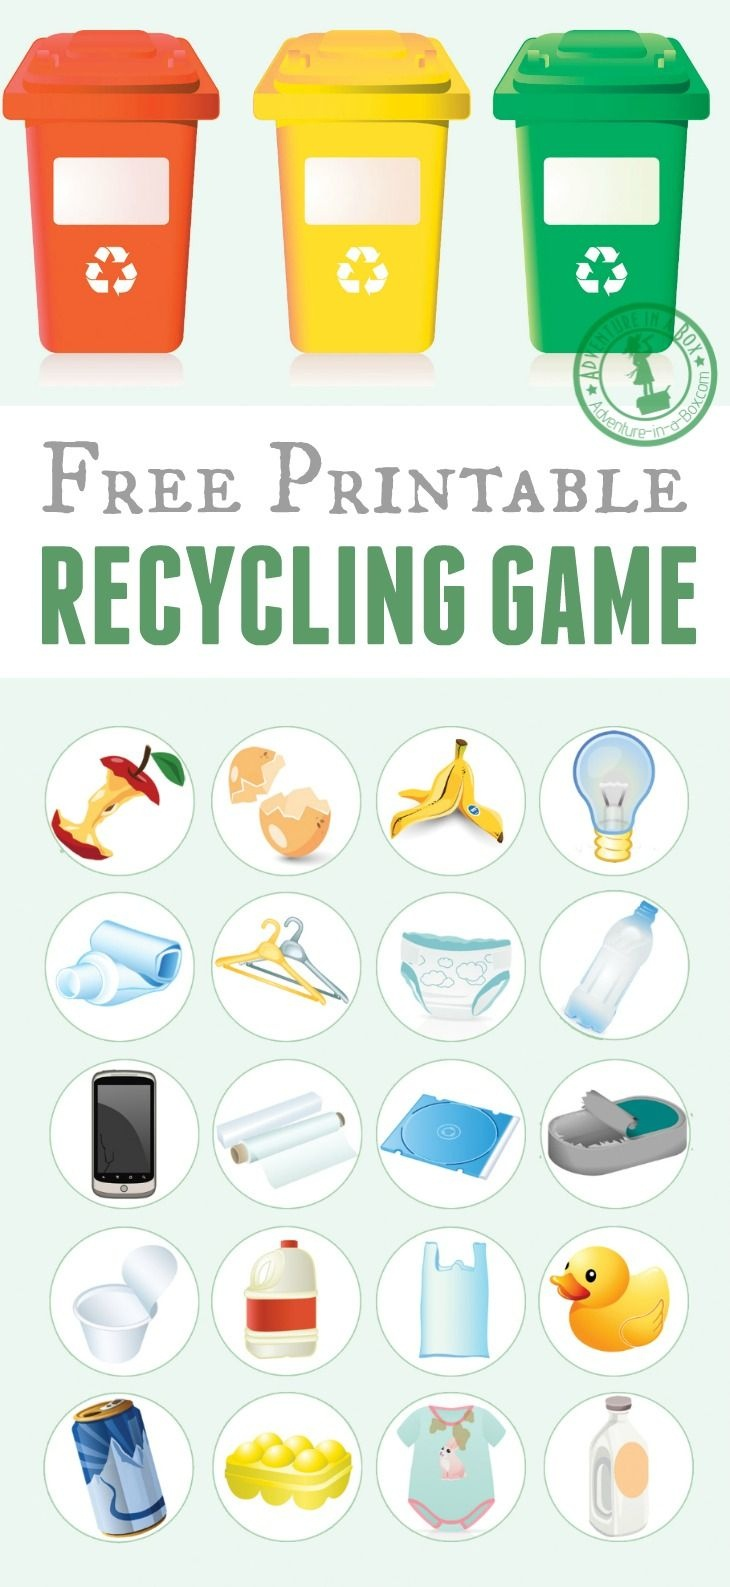 Printable Recycling Game | Free Printable Of The Day | Recycling - Free Printable Recycling Worksheets